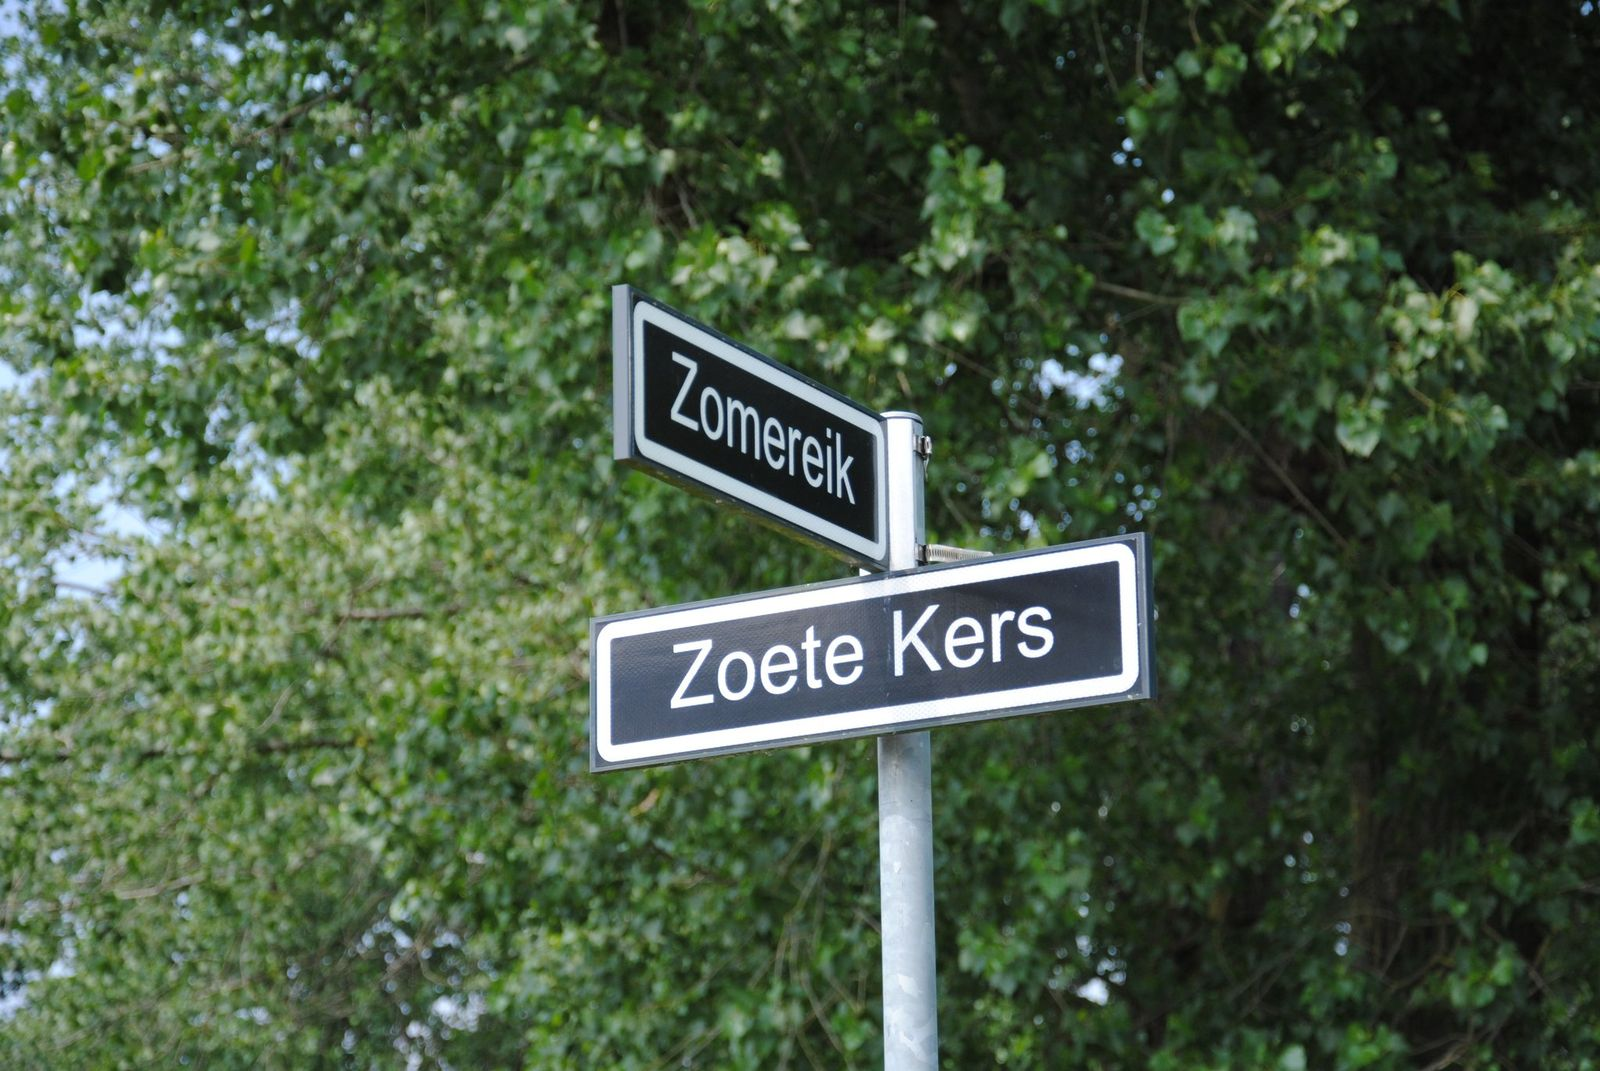 Zoete Kers 0-ong, Helmond